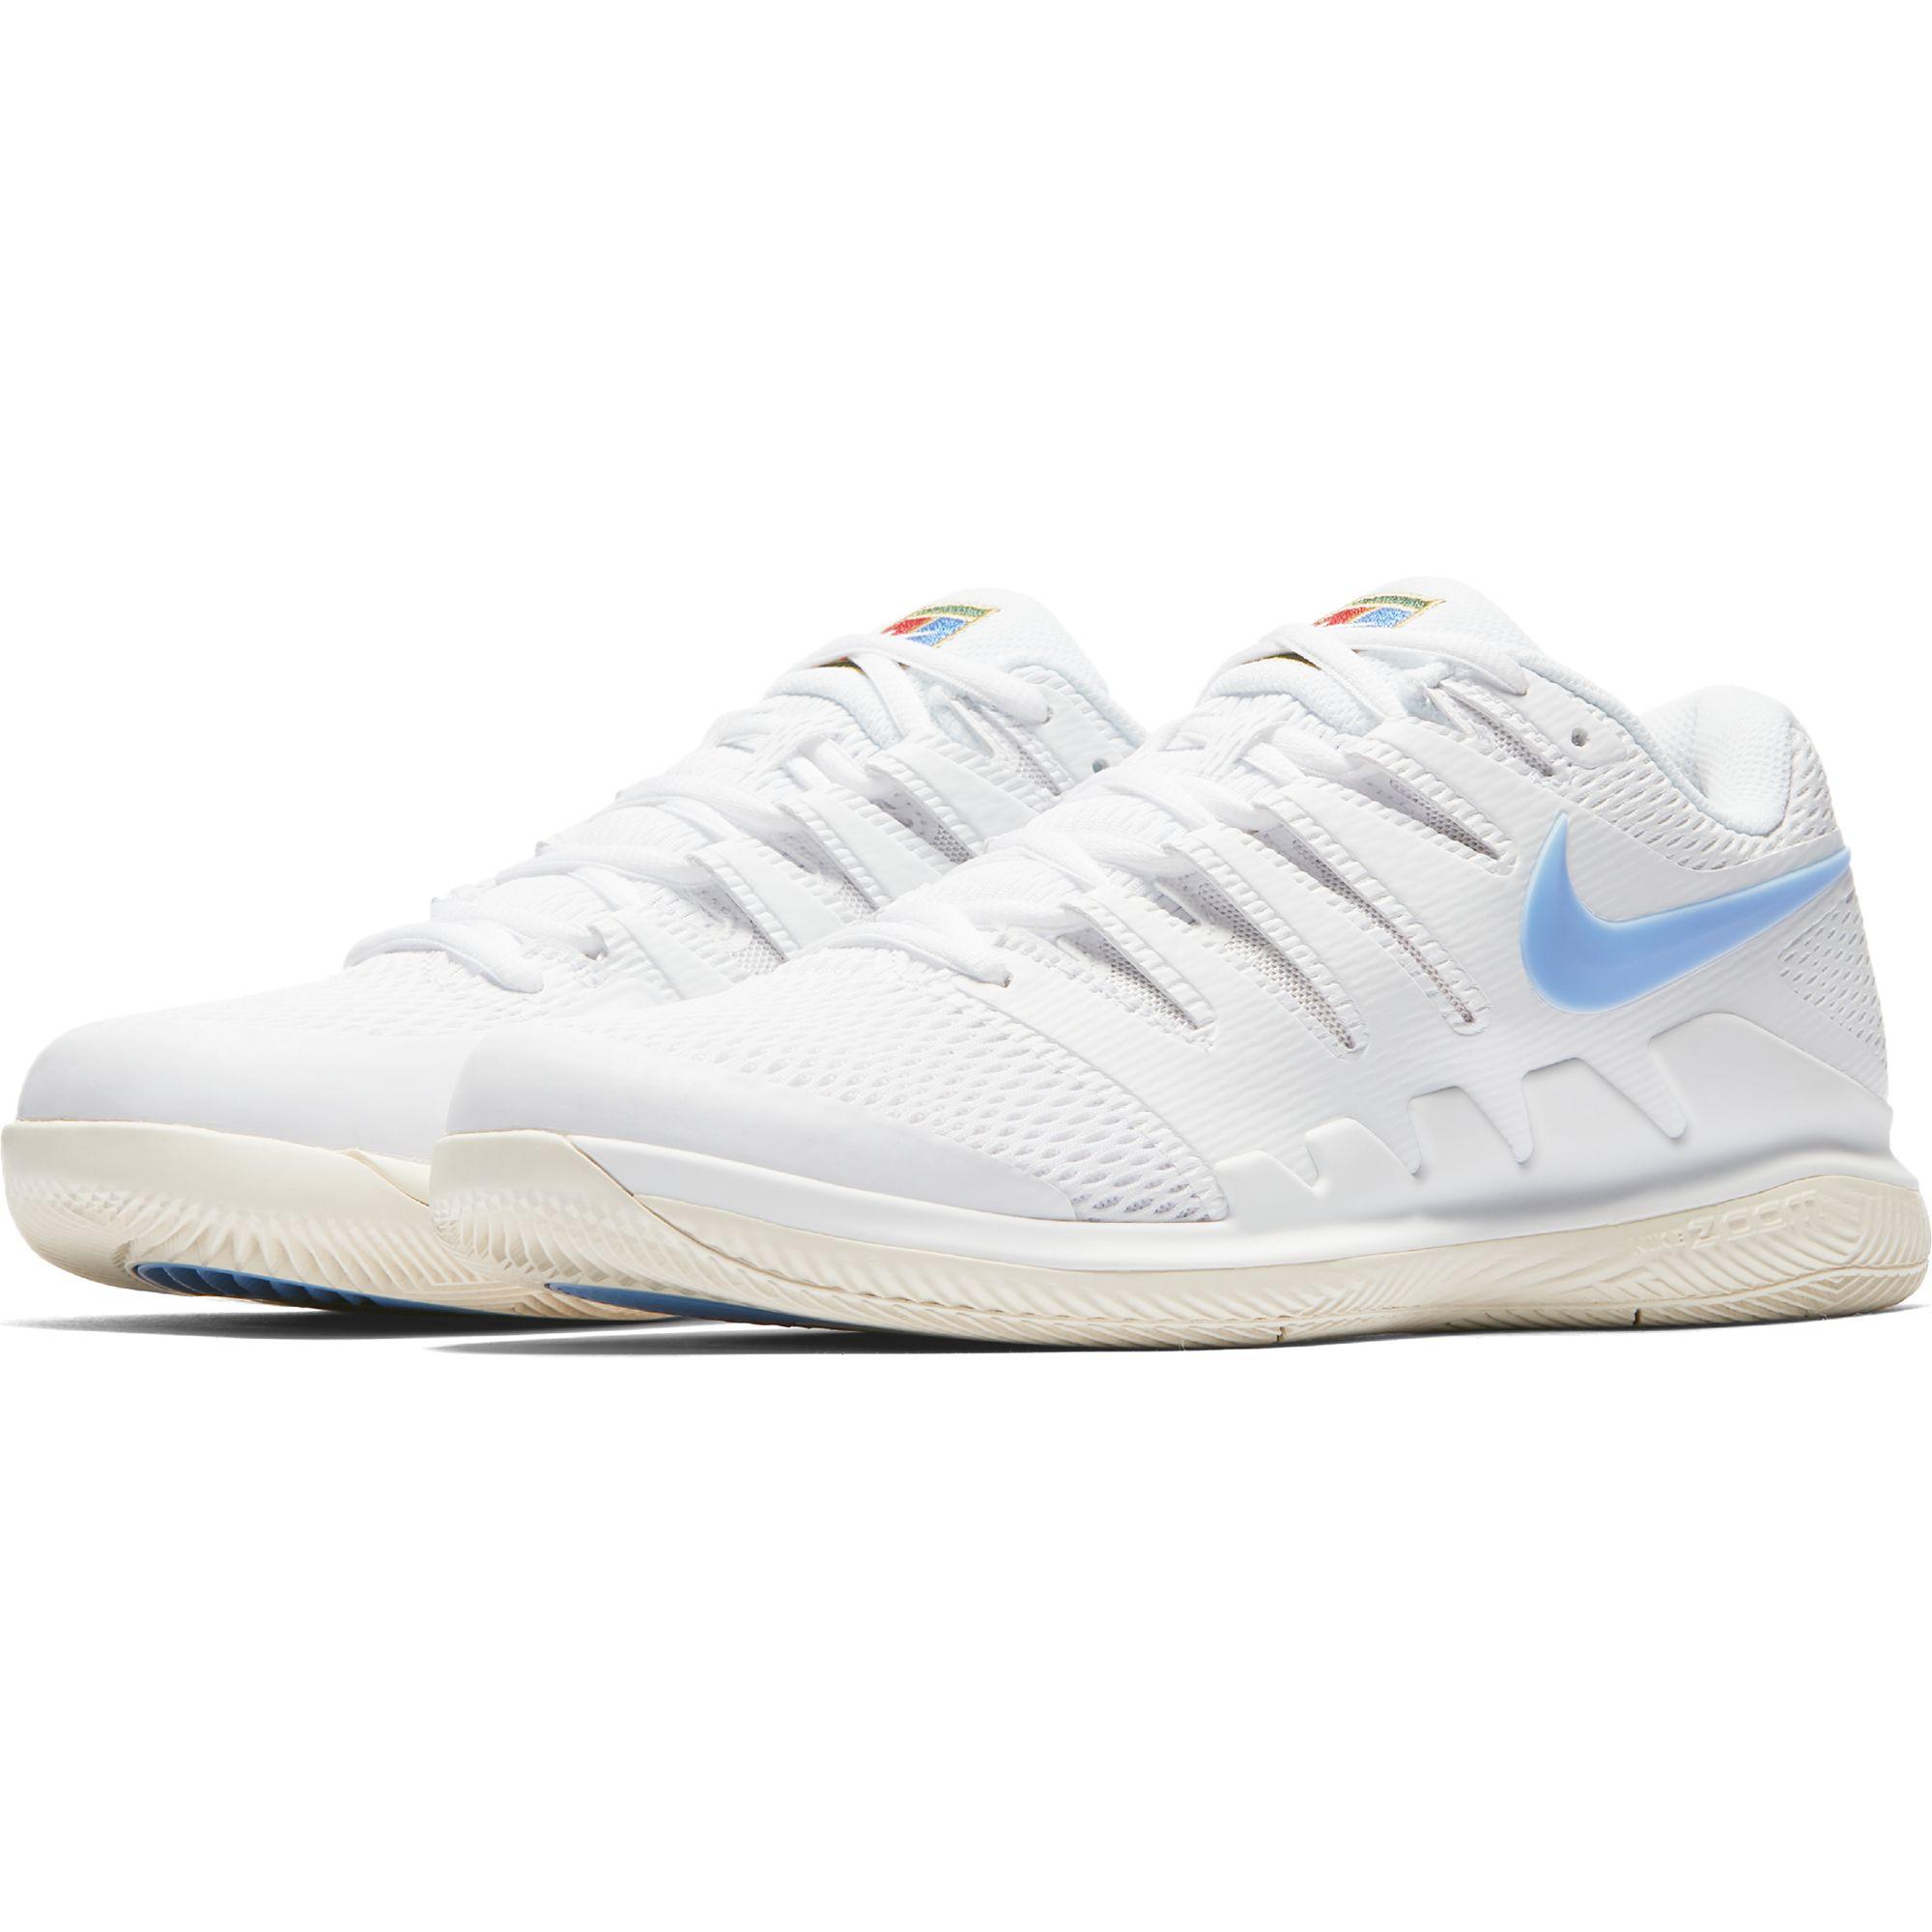 Air Zoom Vapor X HC - Boy/Girl Tennis Shoes - OFFER | ???? Tienda TENIS